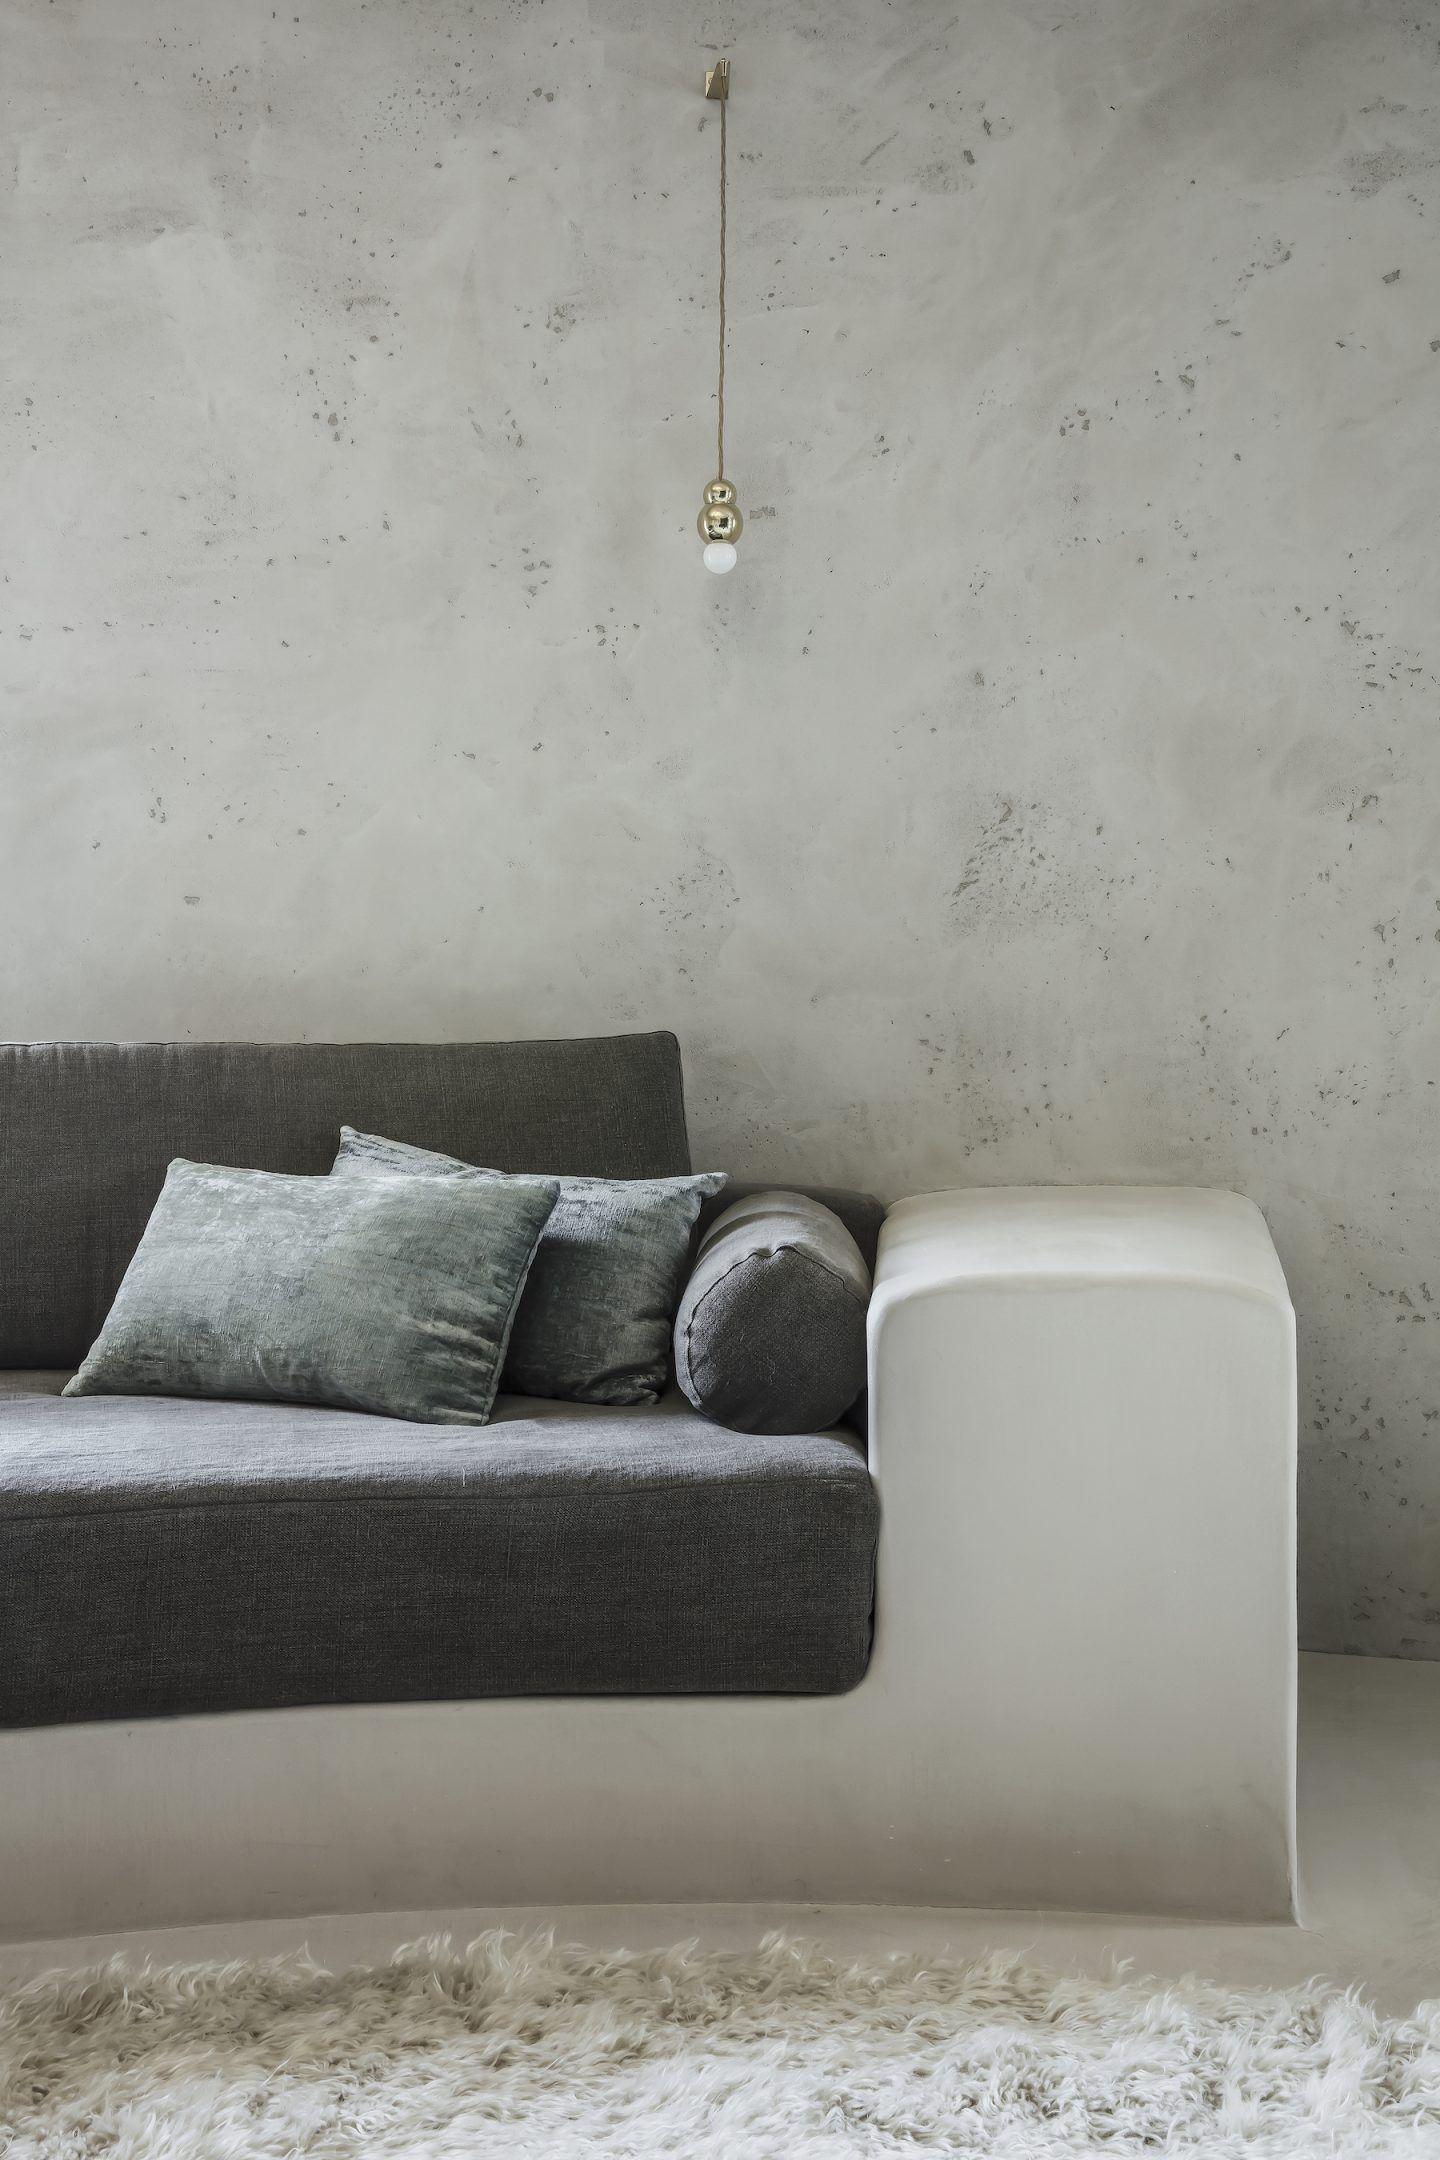 IGNANT-Architecture-Arjaan-De-Feyter-Silo-Apartment-05